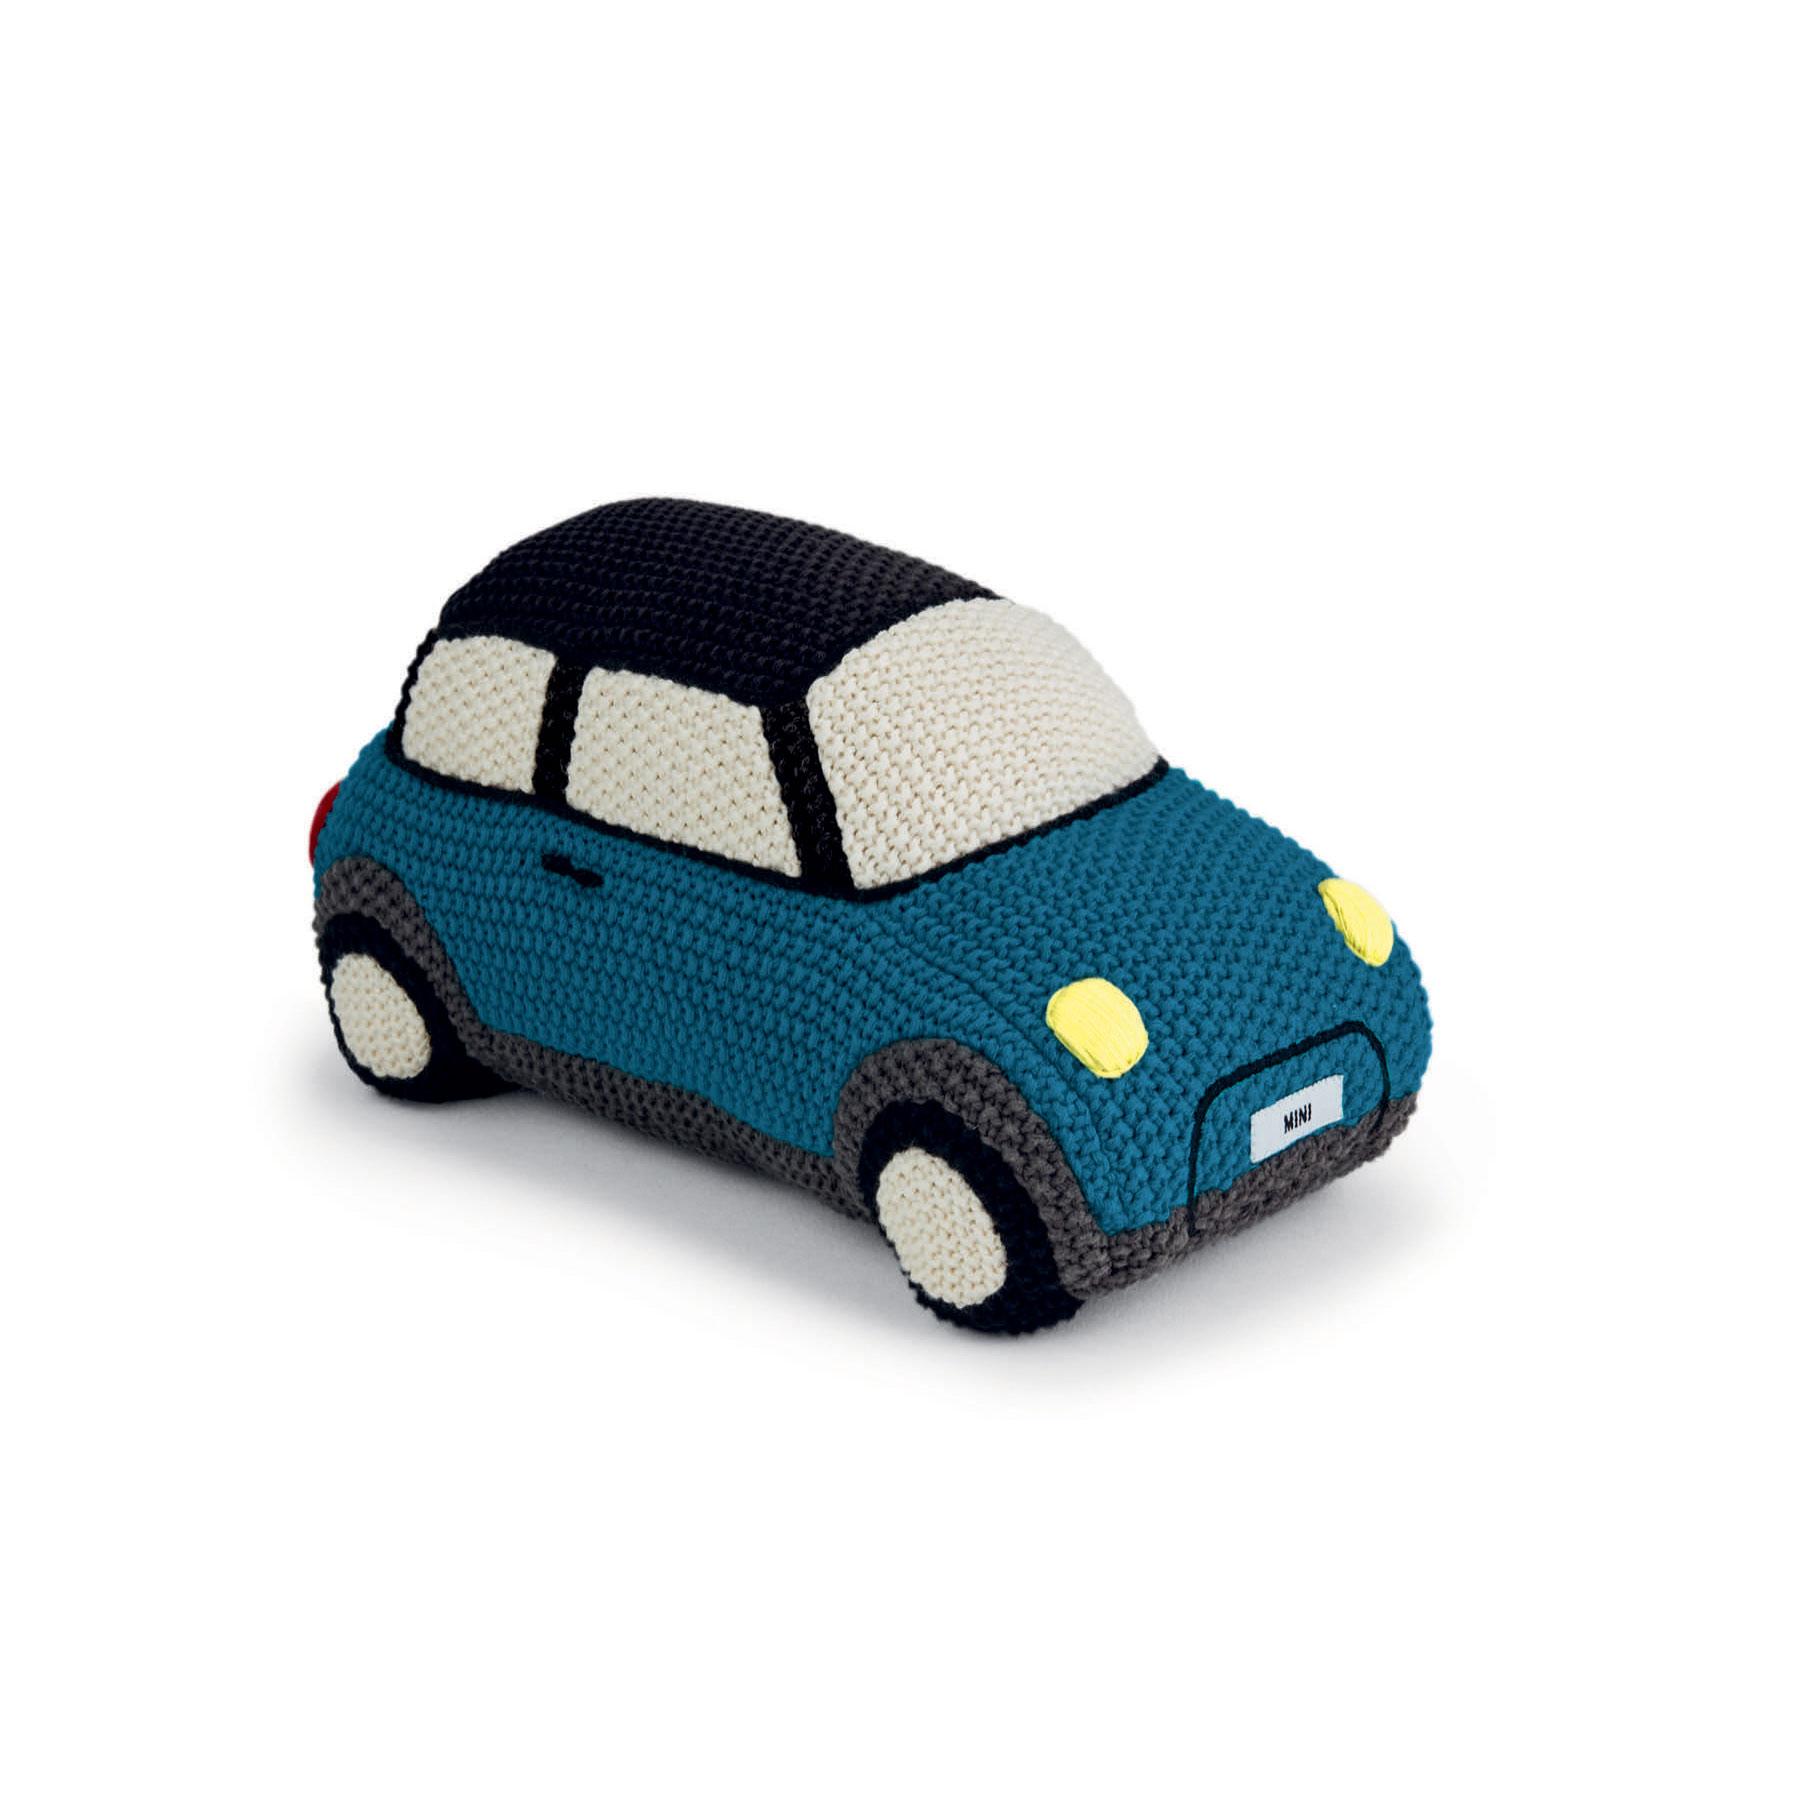 80452460913 RRP £30 MINI BMW Knitted Car